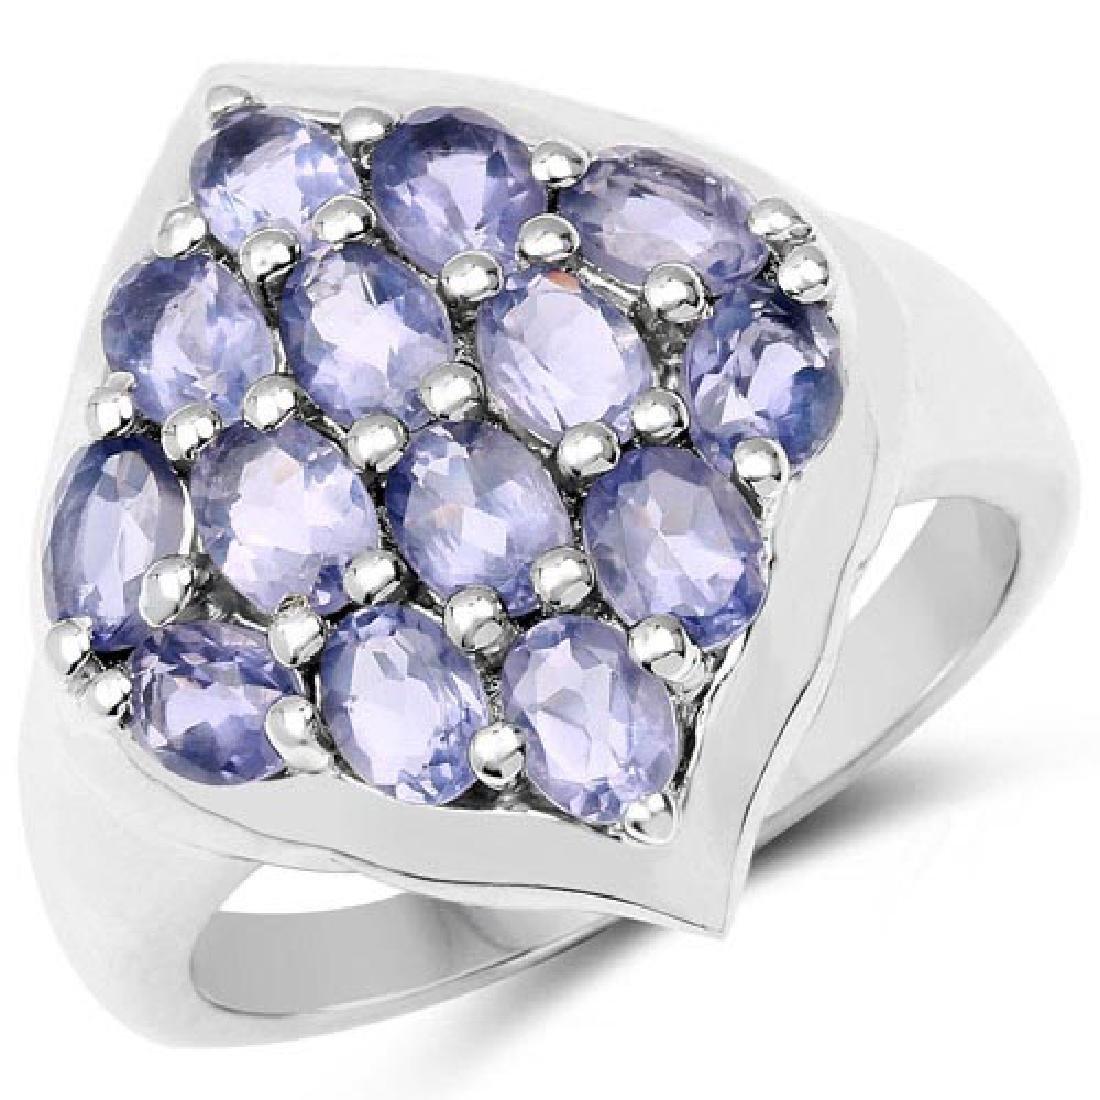 2.38 Carat Genuine Iolite .925 Sterling Silver Ring